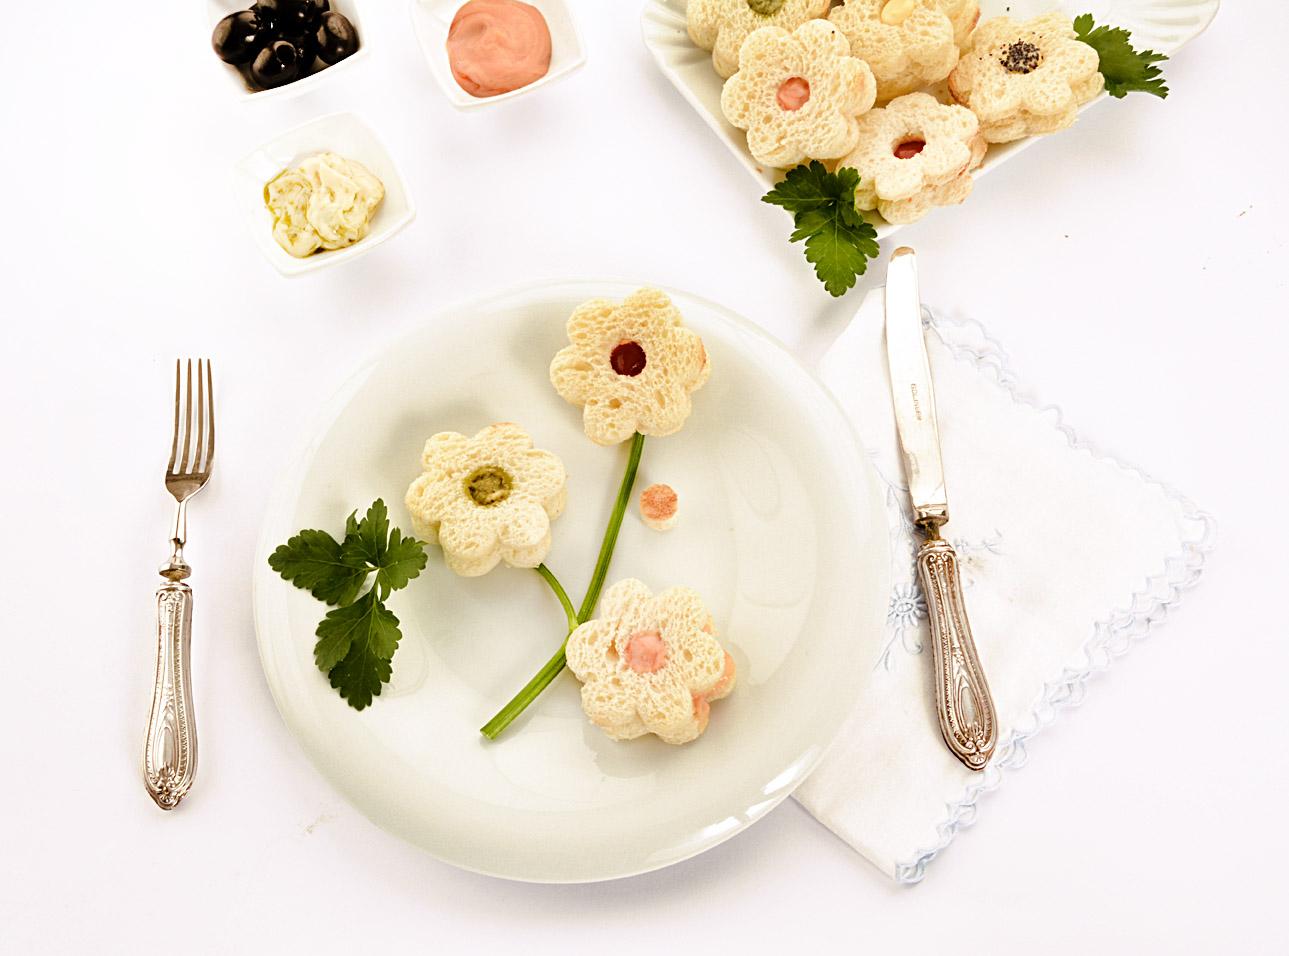 Sandwich fiore, senza glutine